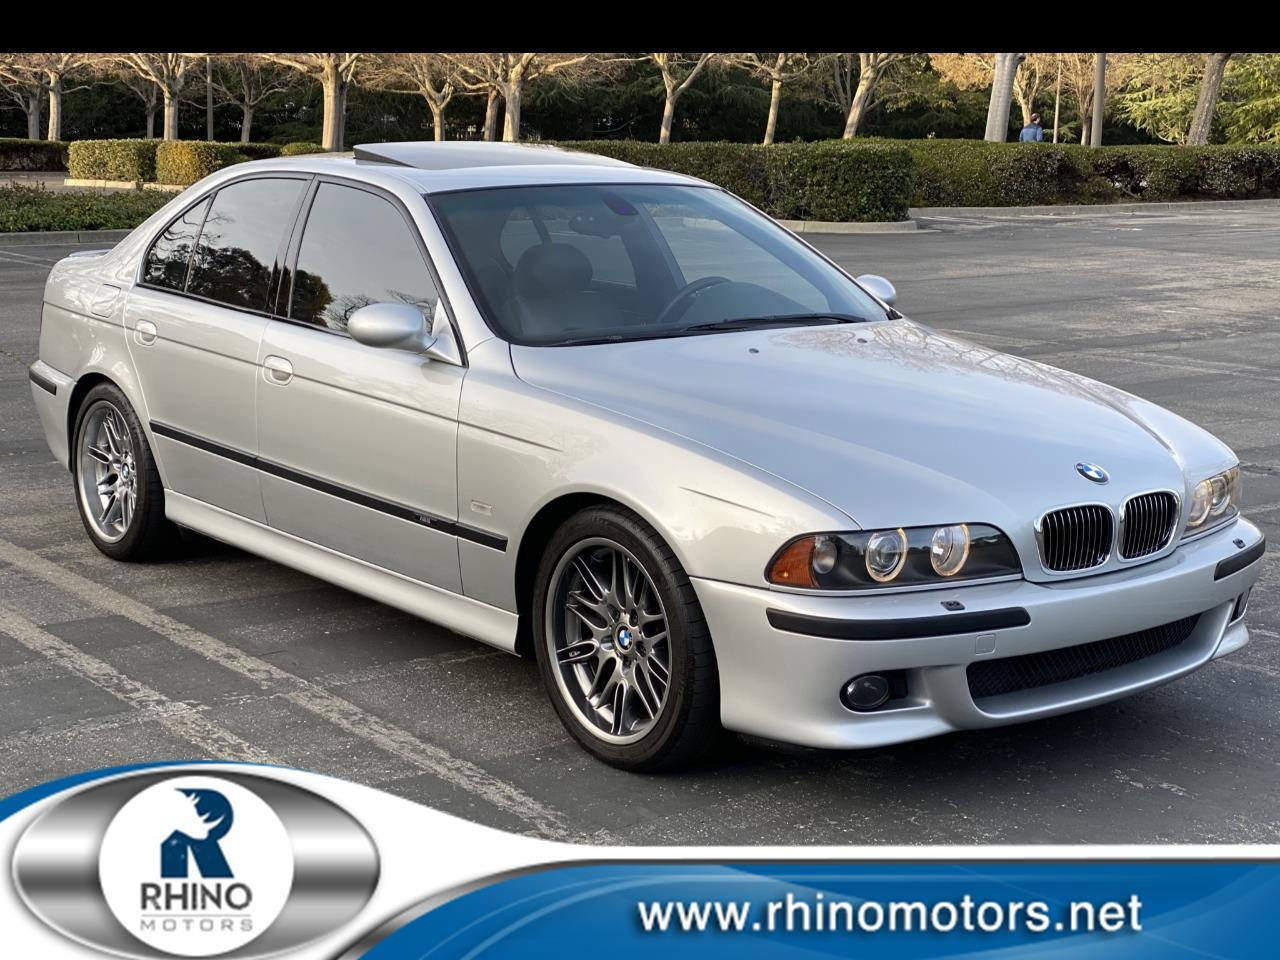 BMW 5 Series M5 4dr Sdn 6-Spd Manual 2001